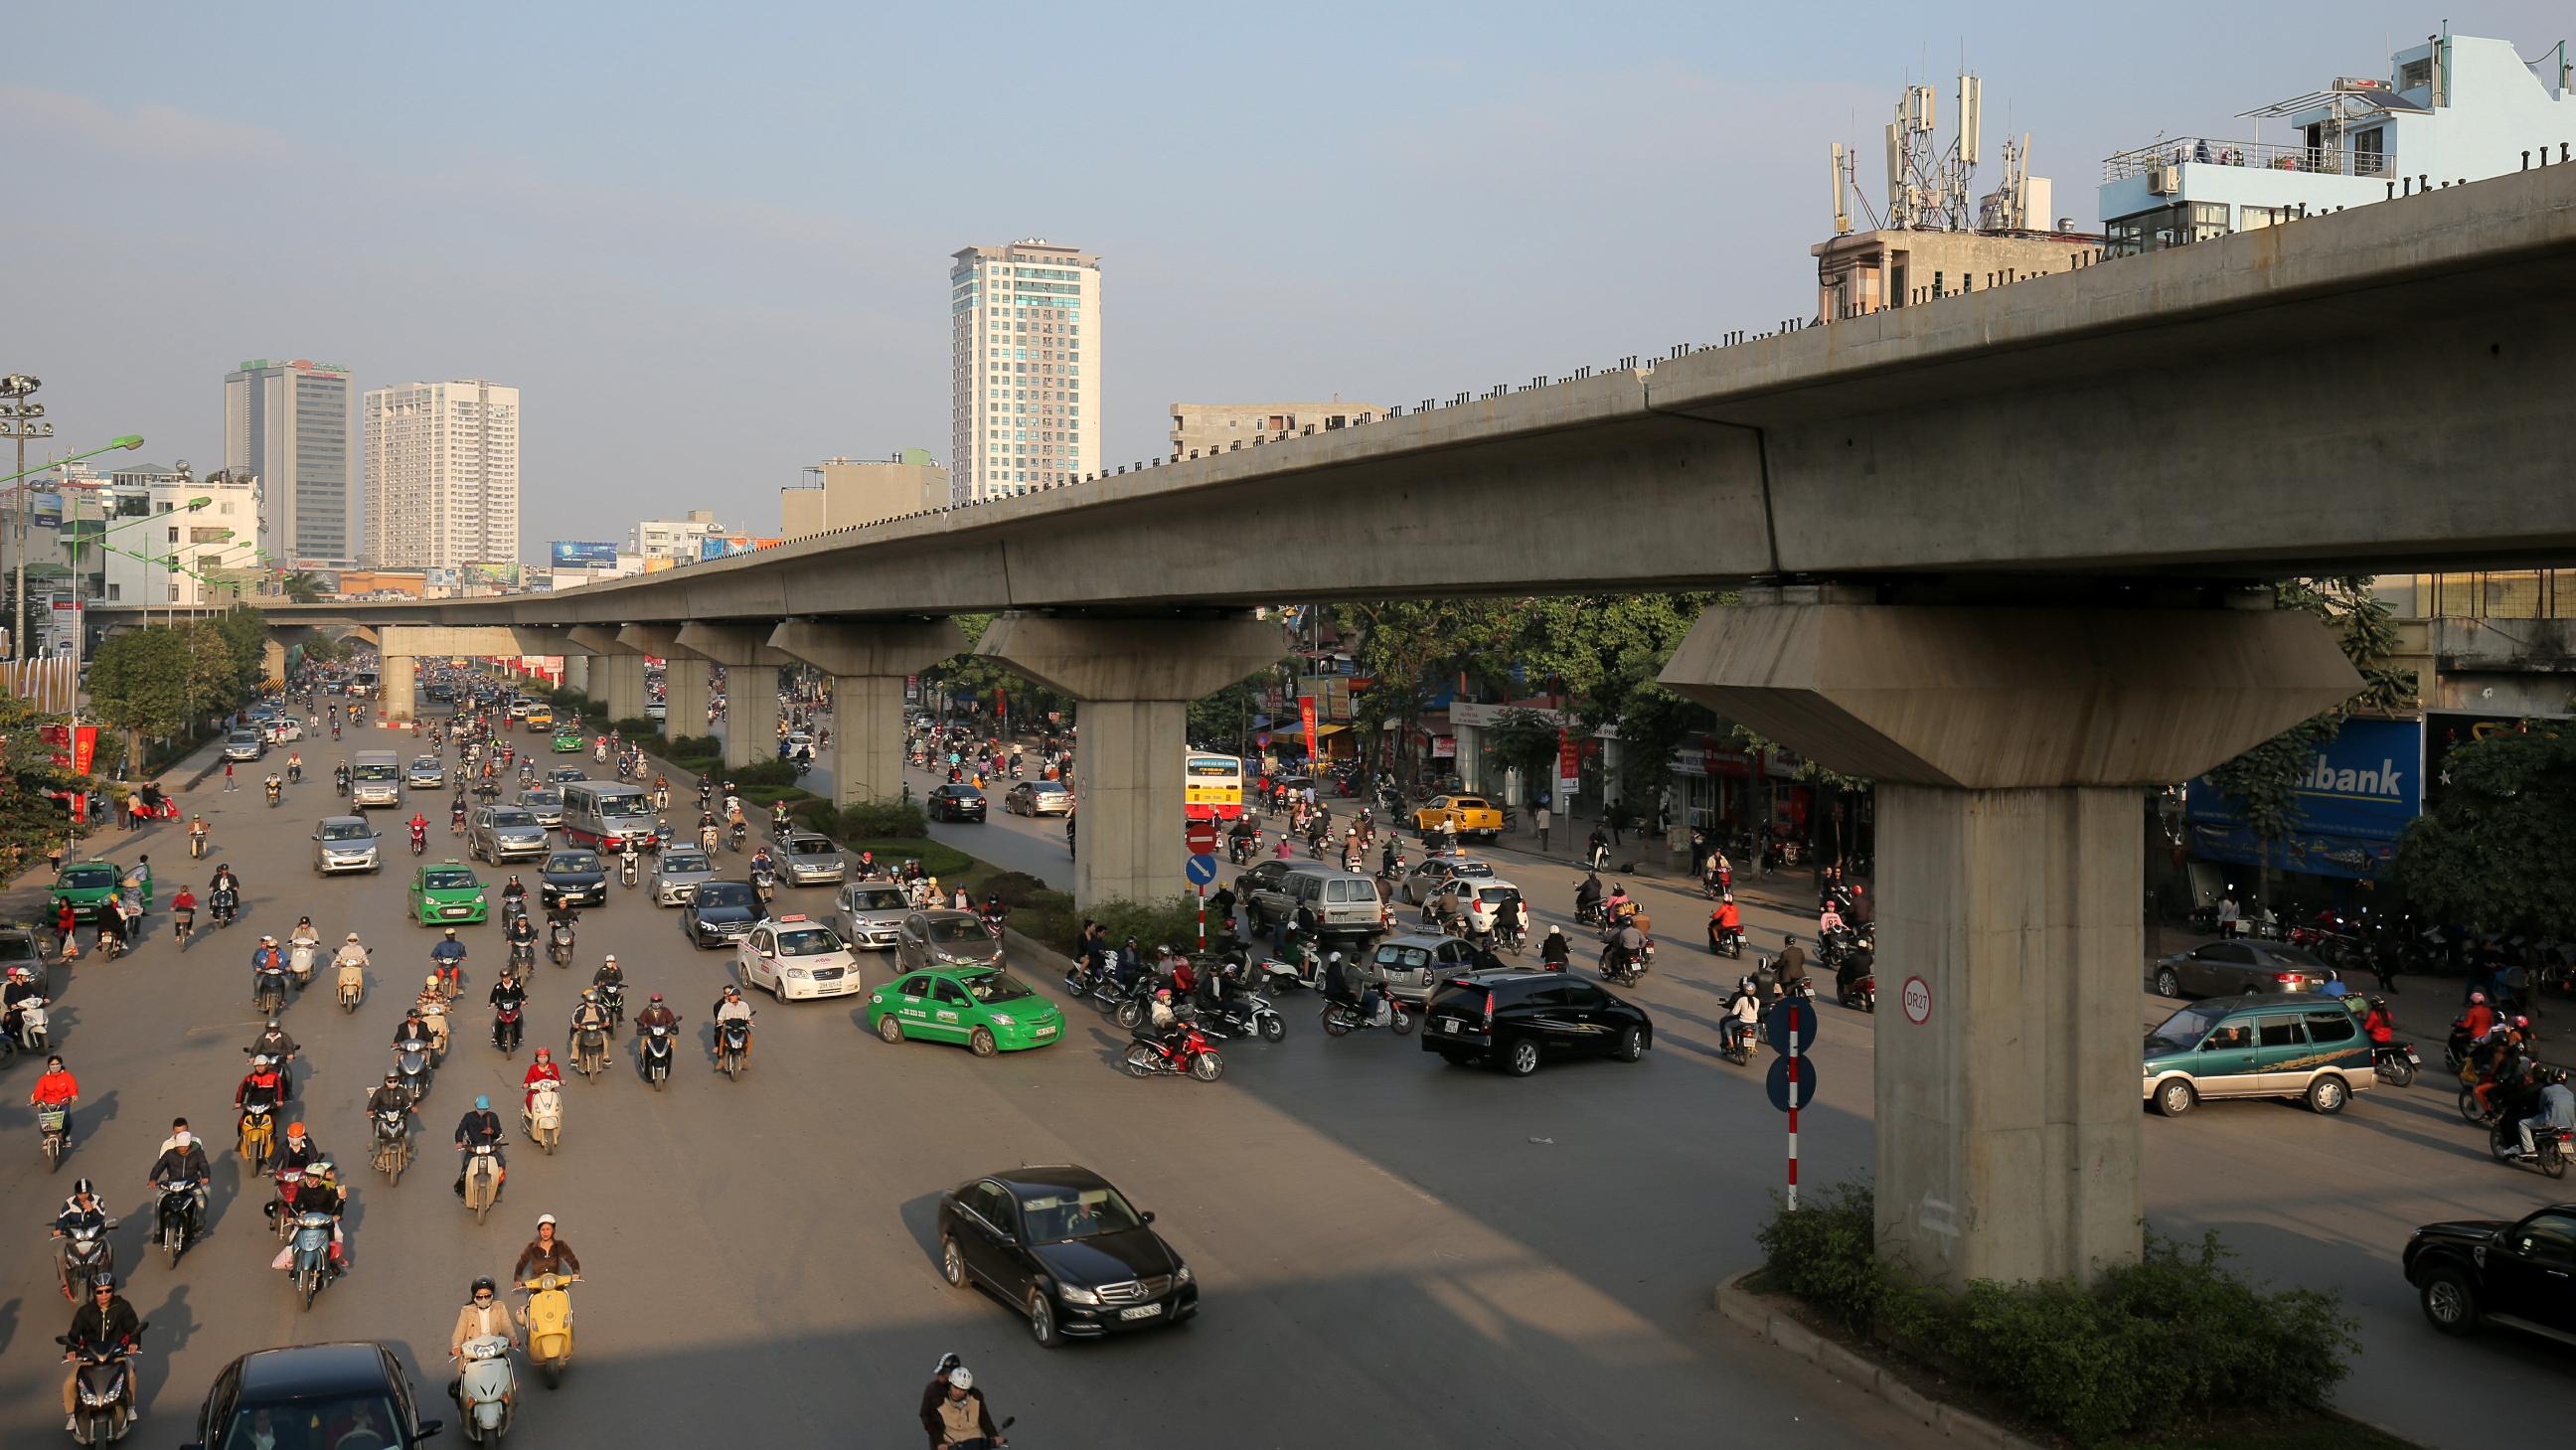 Tuyến Metro Hà Nội